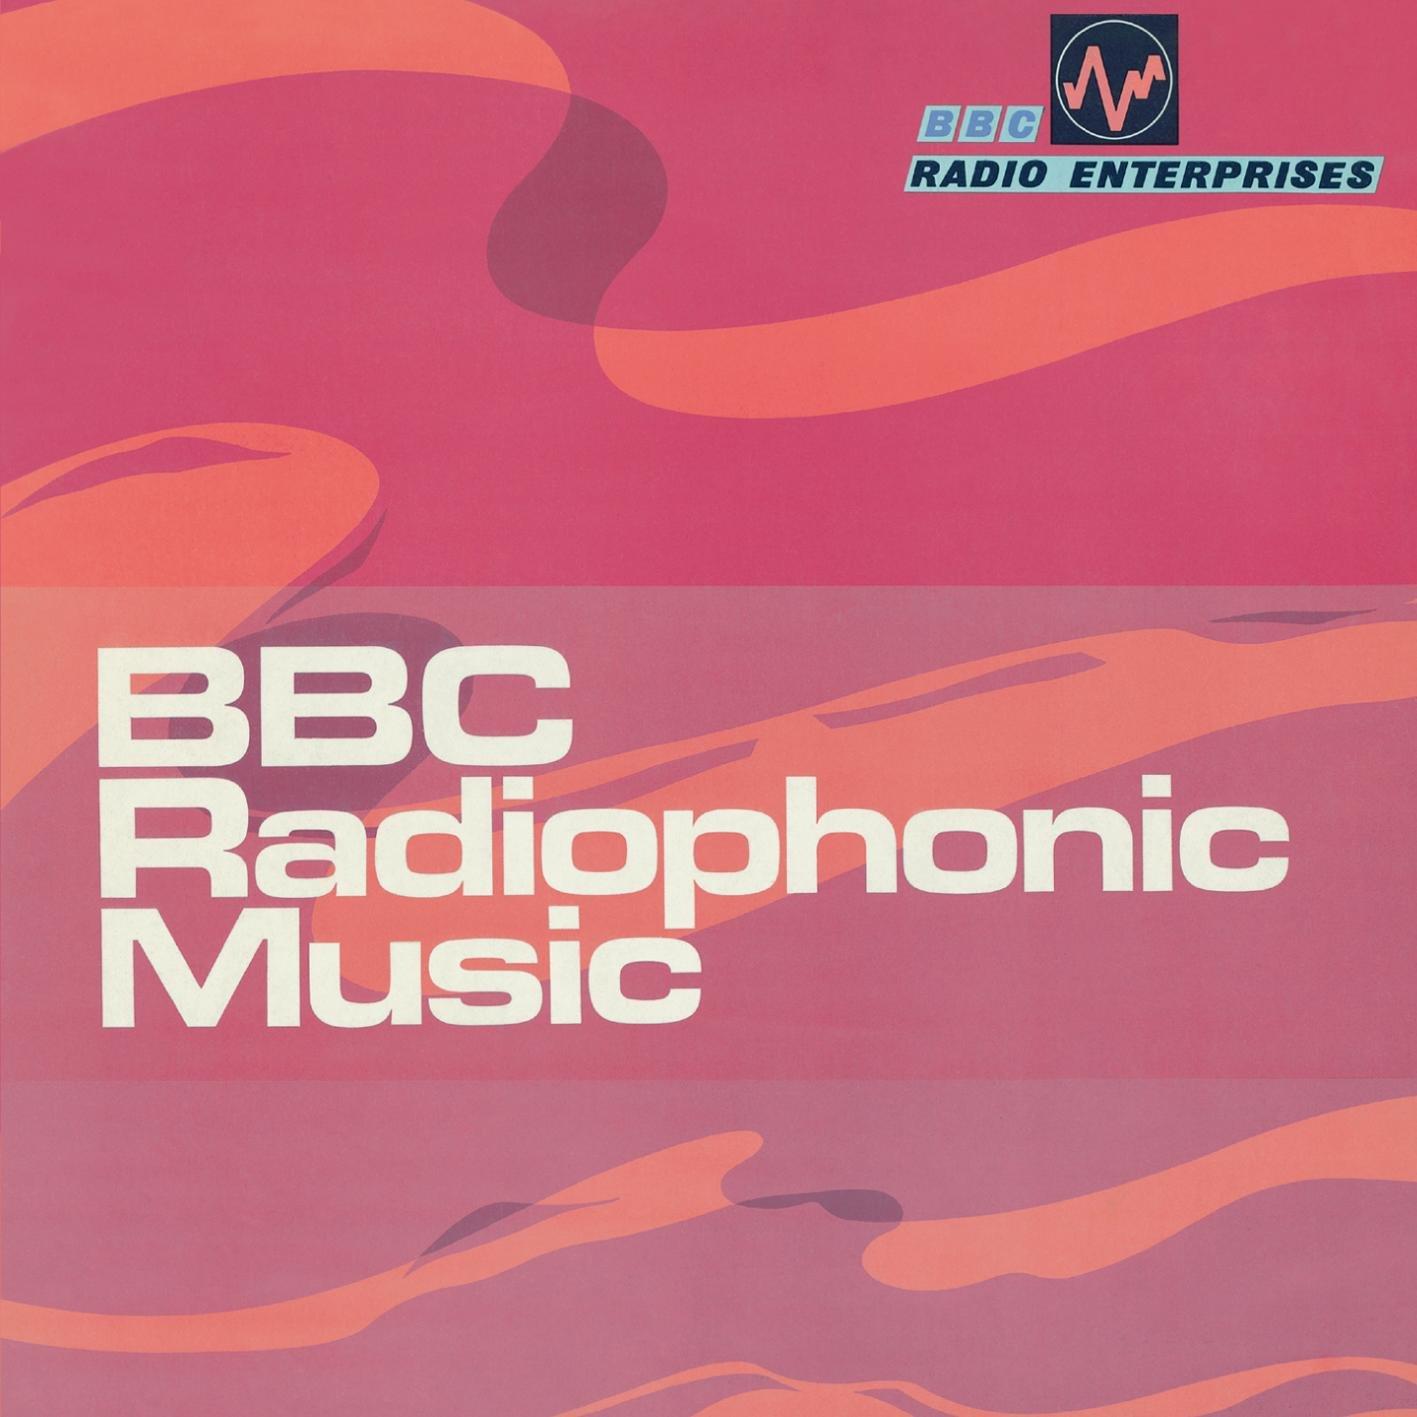 BBC Radiophonic Music by David Cain, John Baker, Delia Derbyshire: Amazon.co.uk: Music